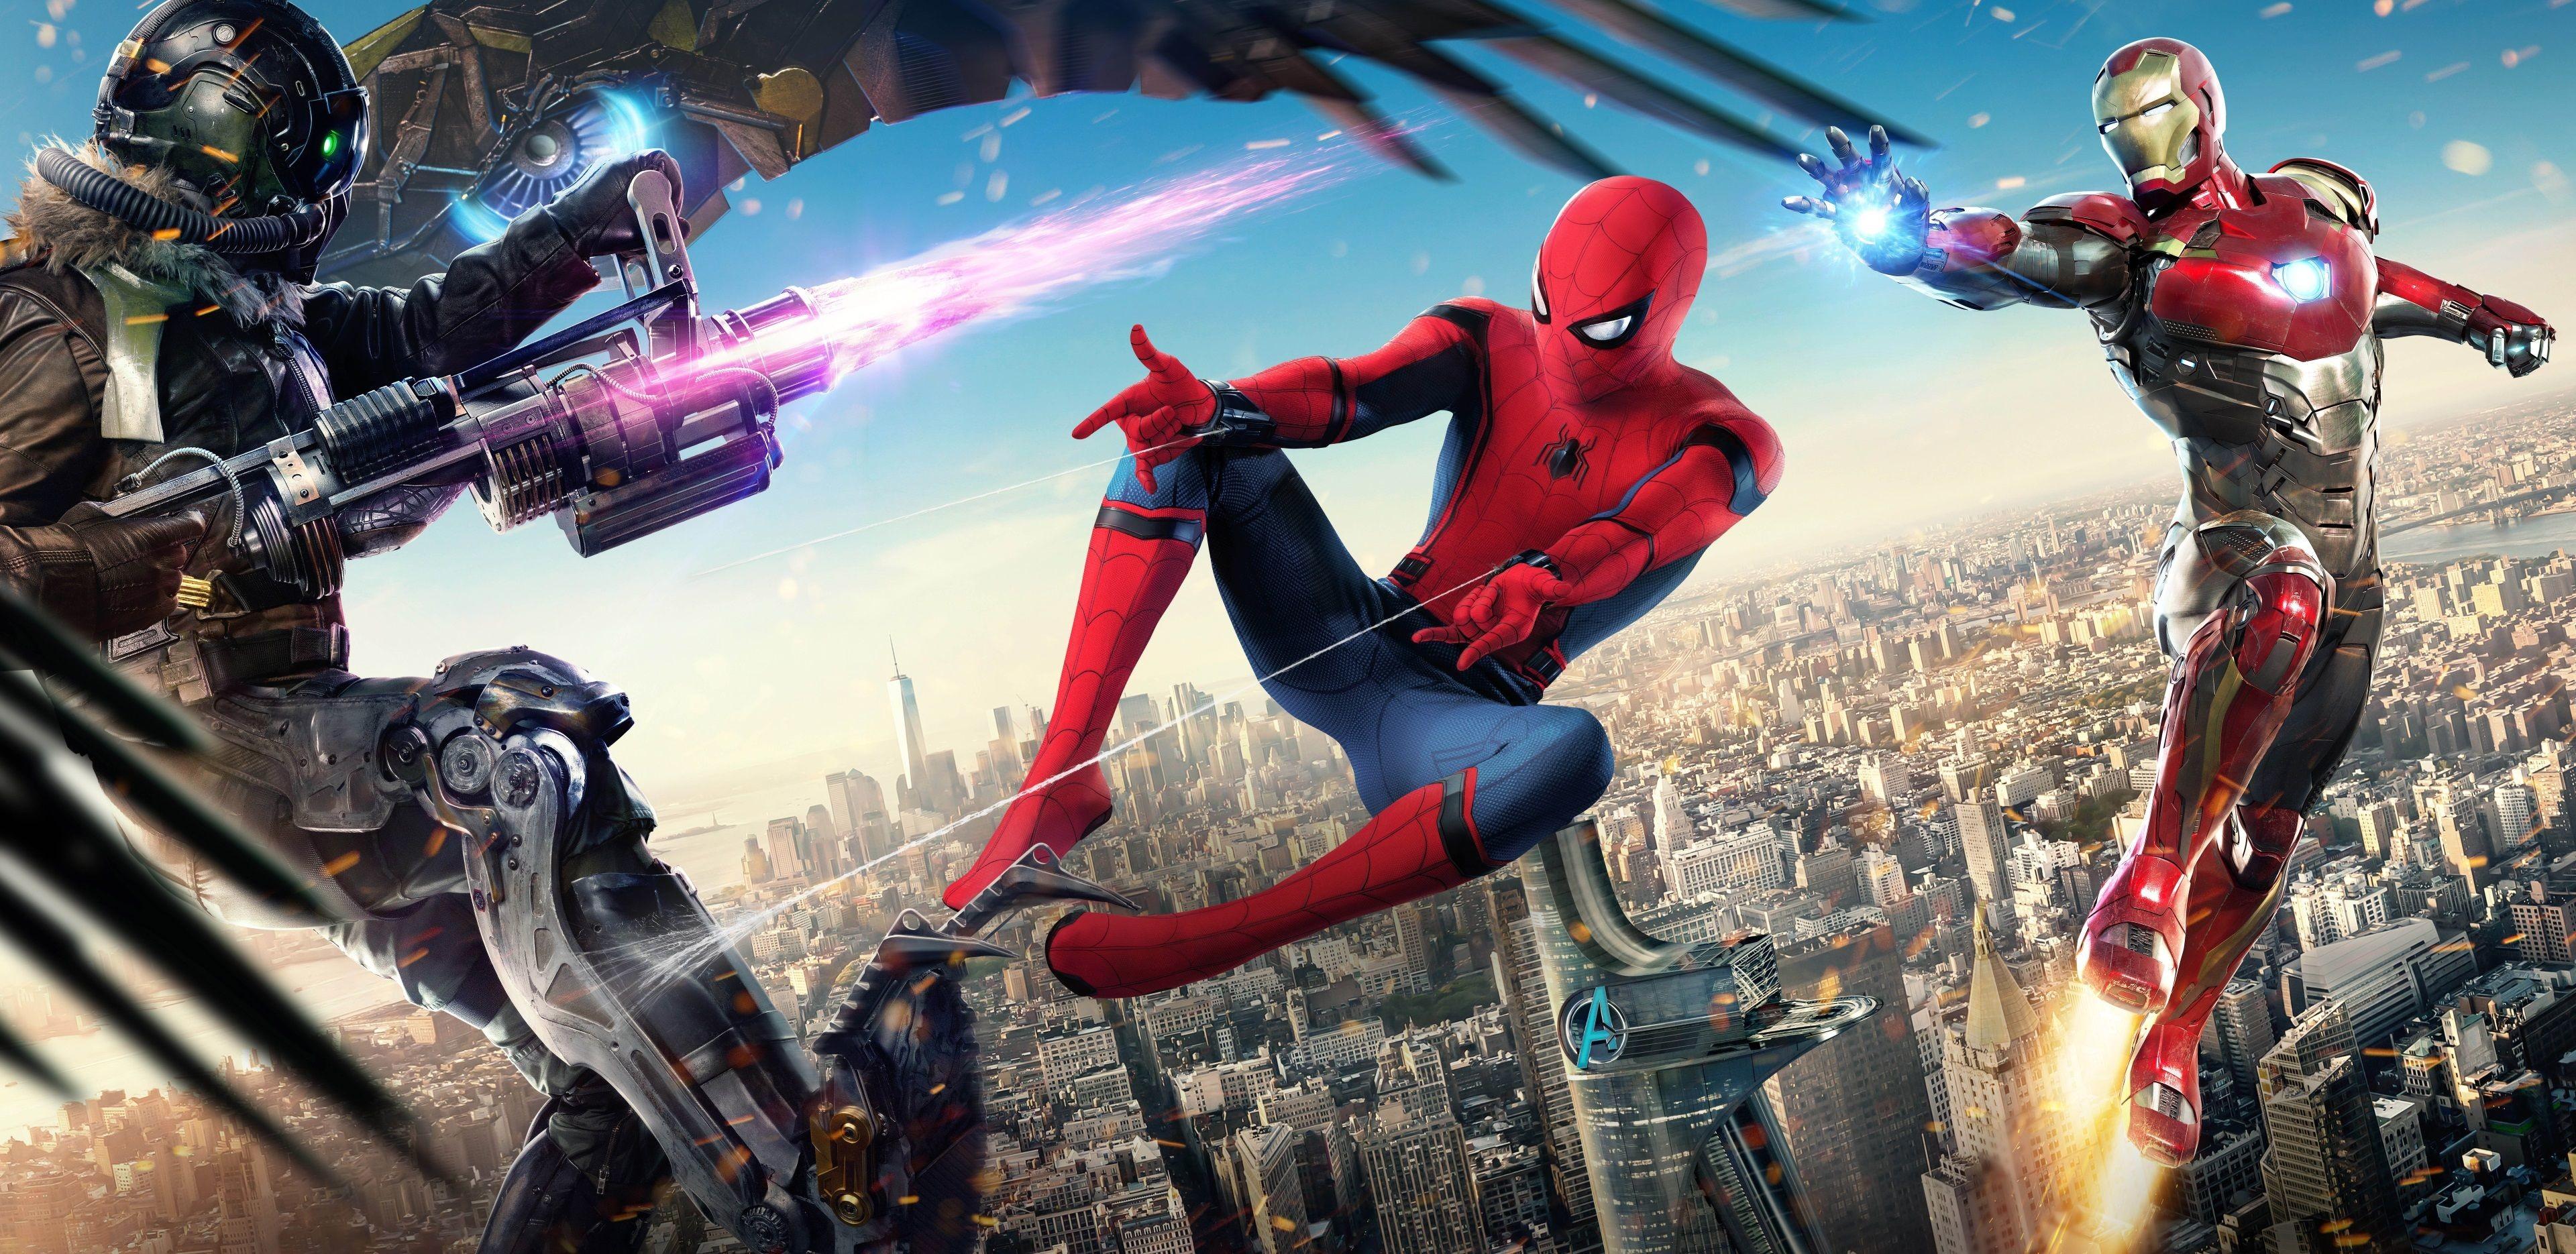 40 Wallpaper Art Spider Man Homecoming On Wallpapersafari